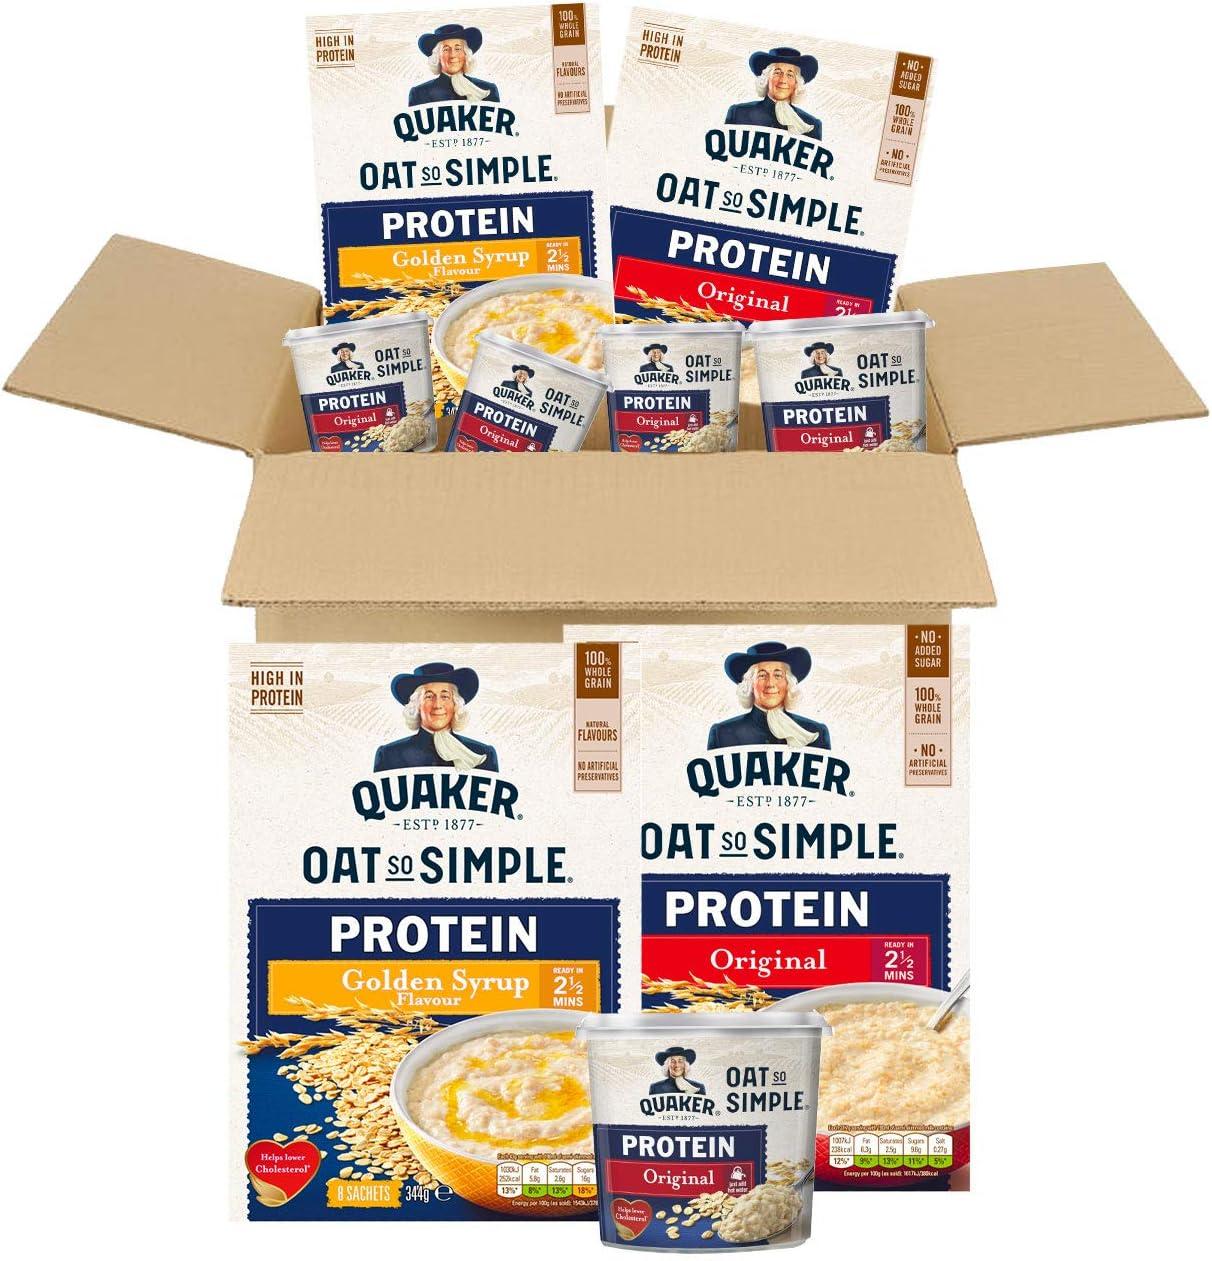 Quaker - Caja de gimnasio con proteínas de avena